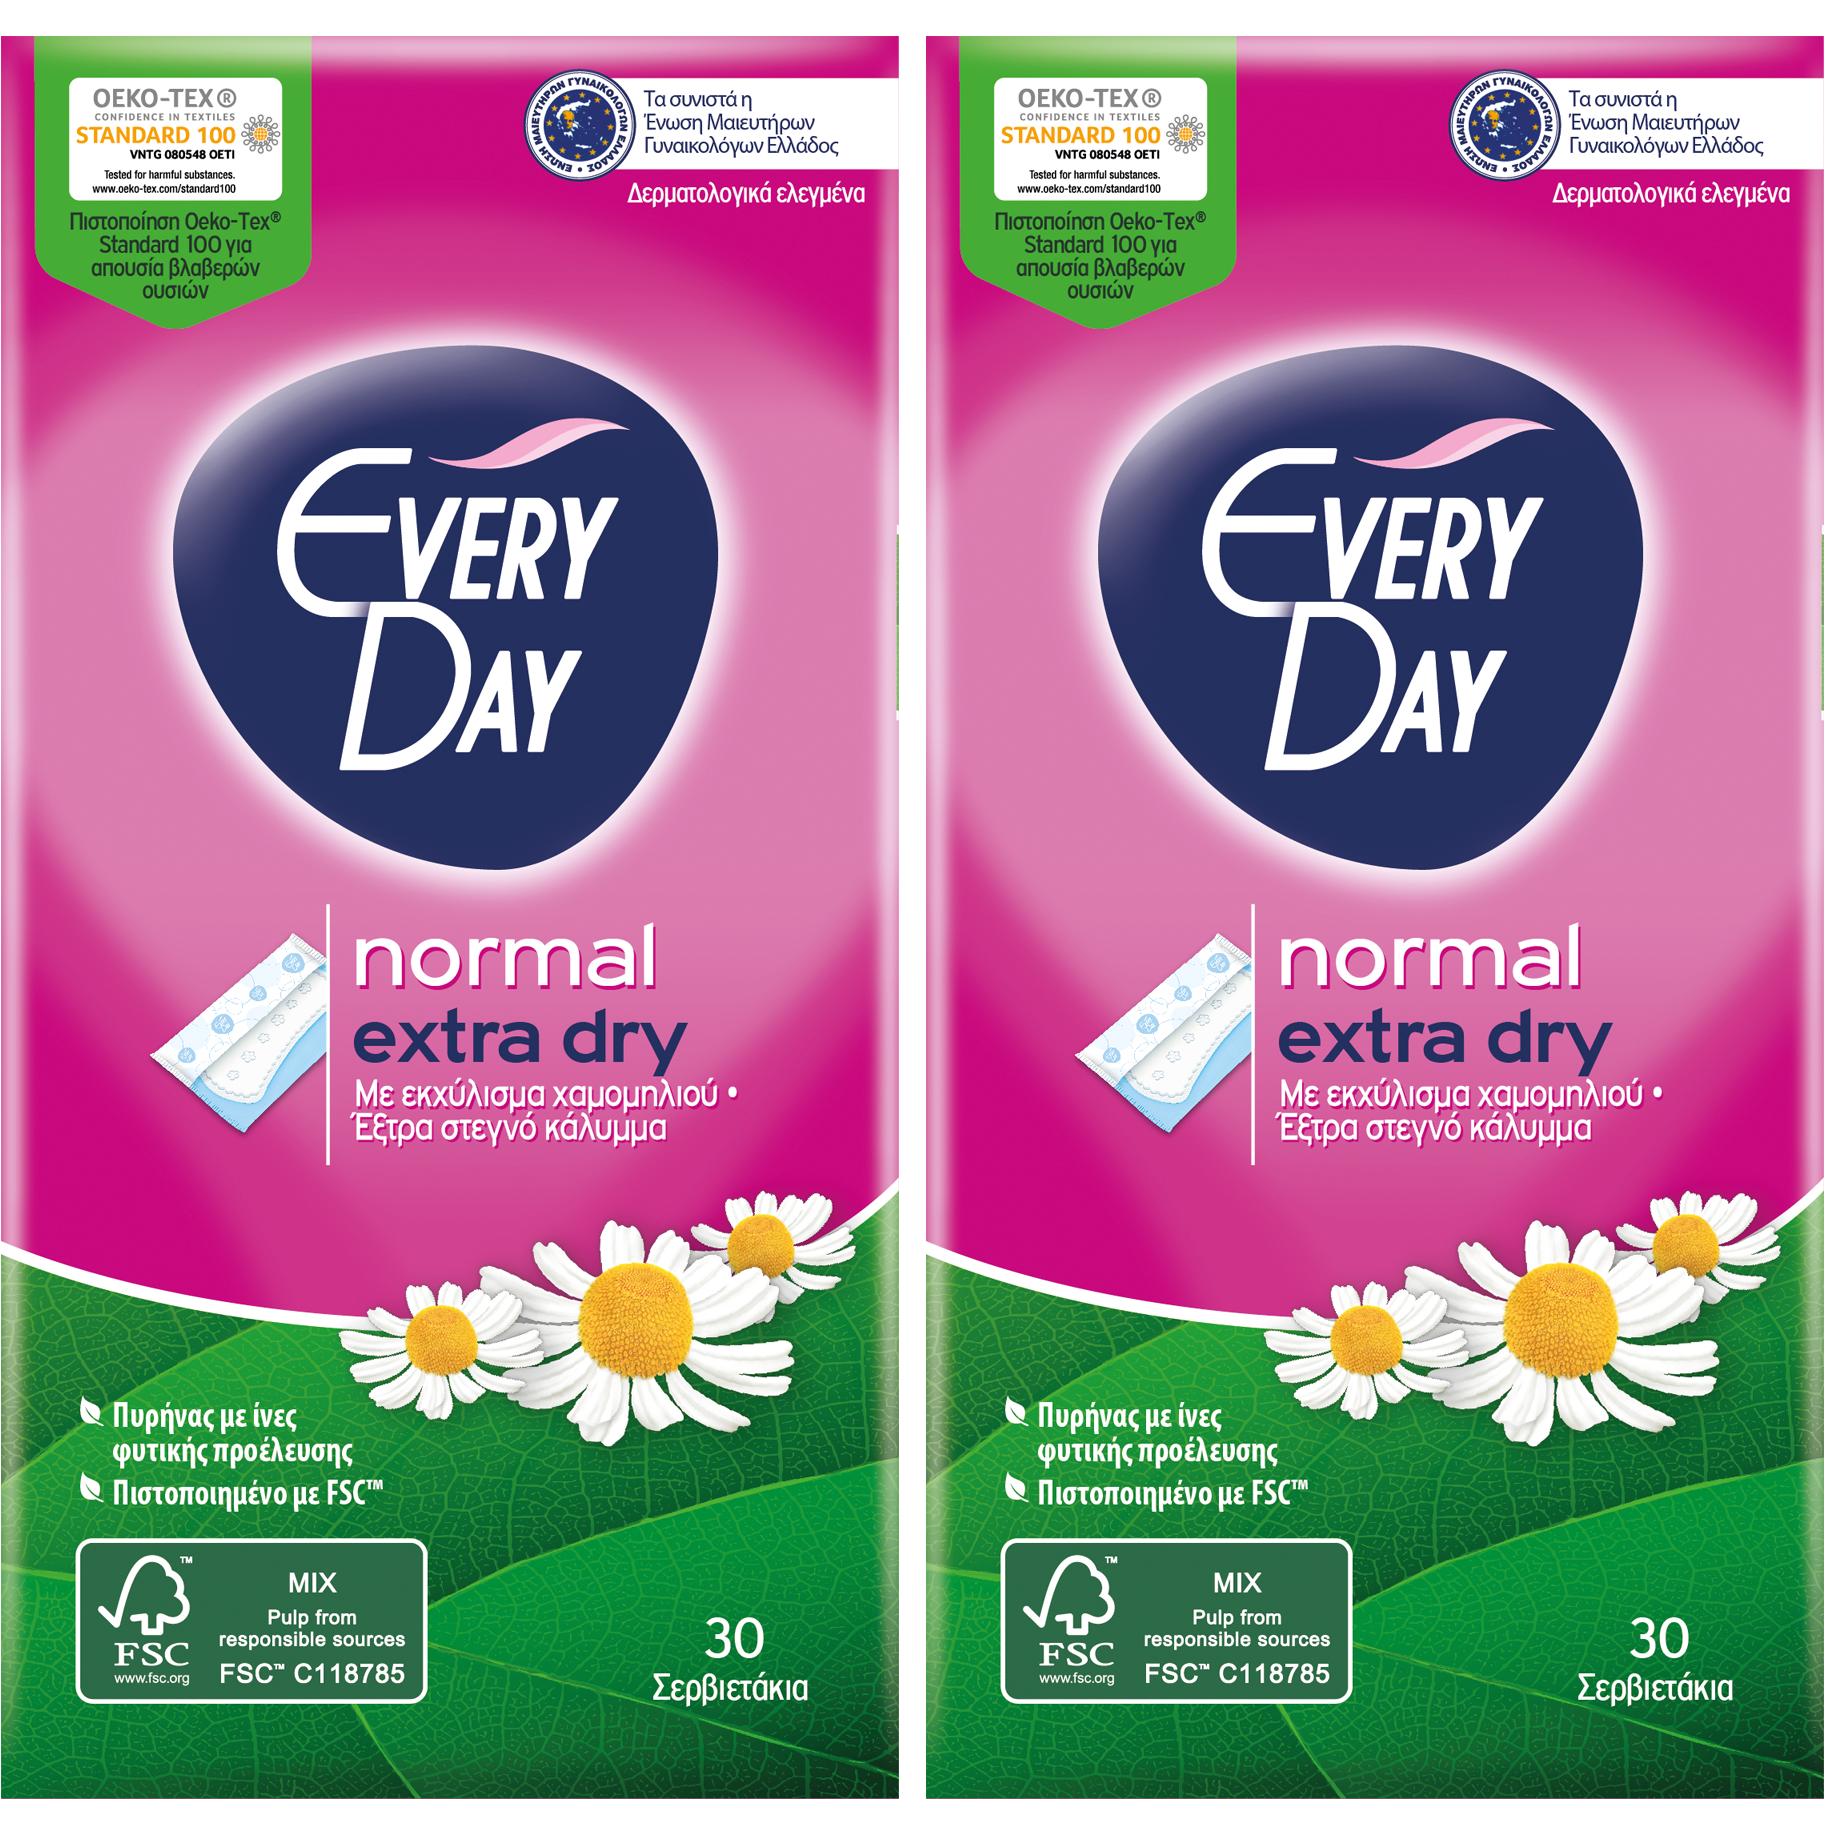 Every Day Πακέτο Προσφοράς Extra Dry Normal Ανατομικά Σερβιετάκια για Κανονική Ροή 2×30 Τεμάχια 1+1 Δώρο